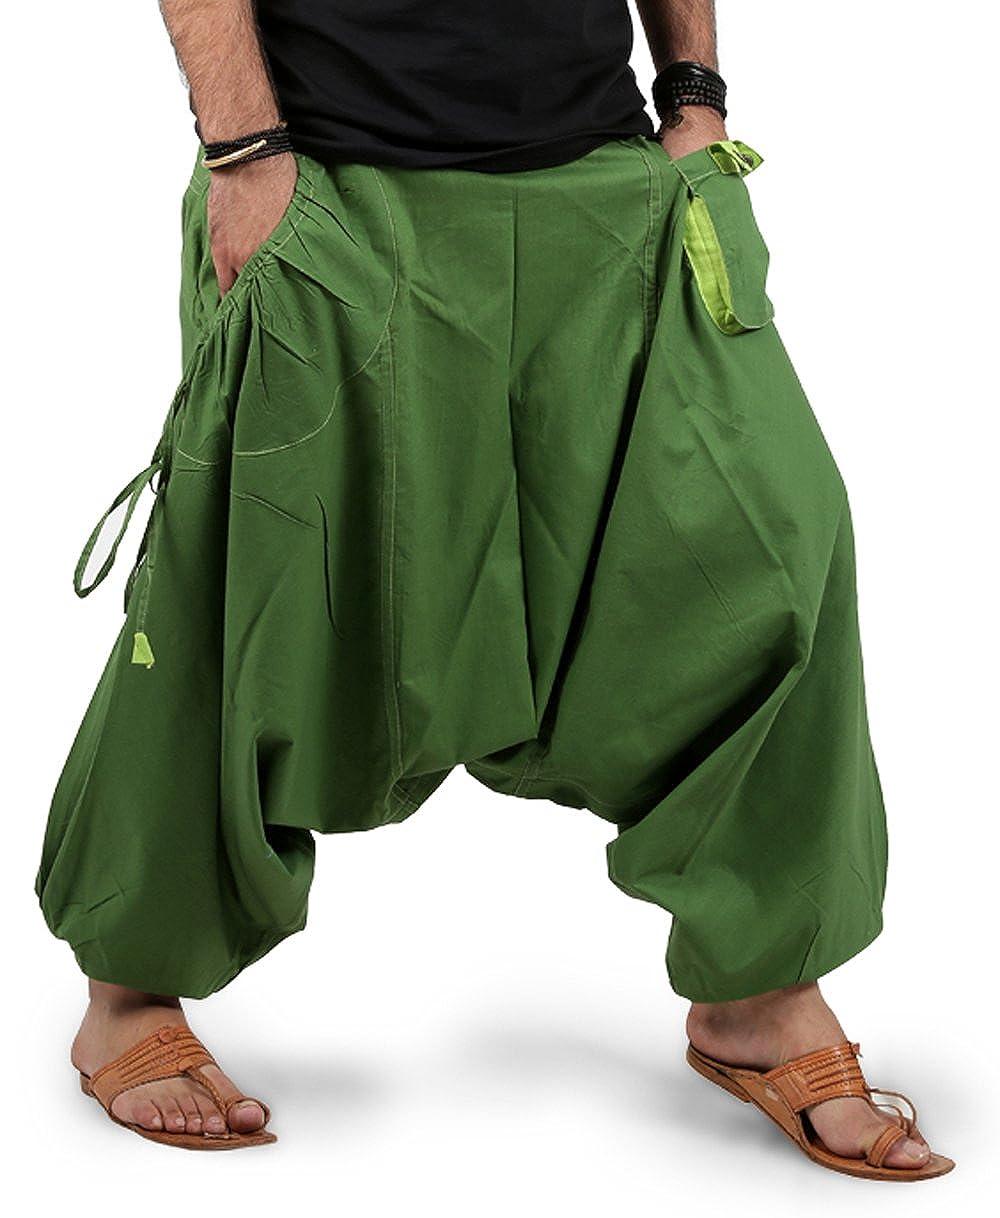 Mens Boys Boho Hippie Baggy Cotton Wide Leg Harem Pants Drop Pockets Style